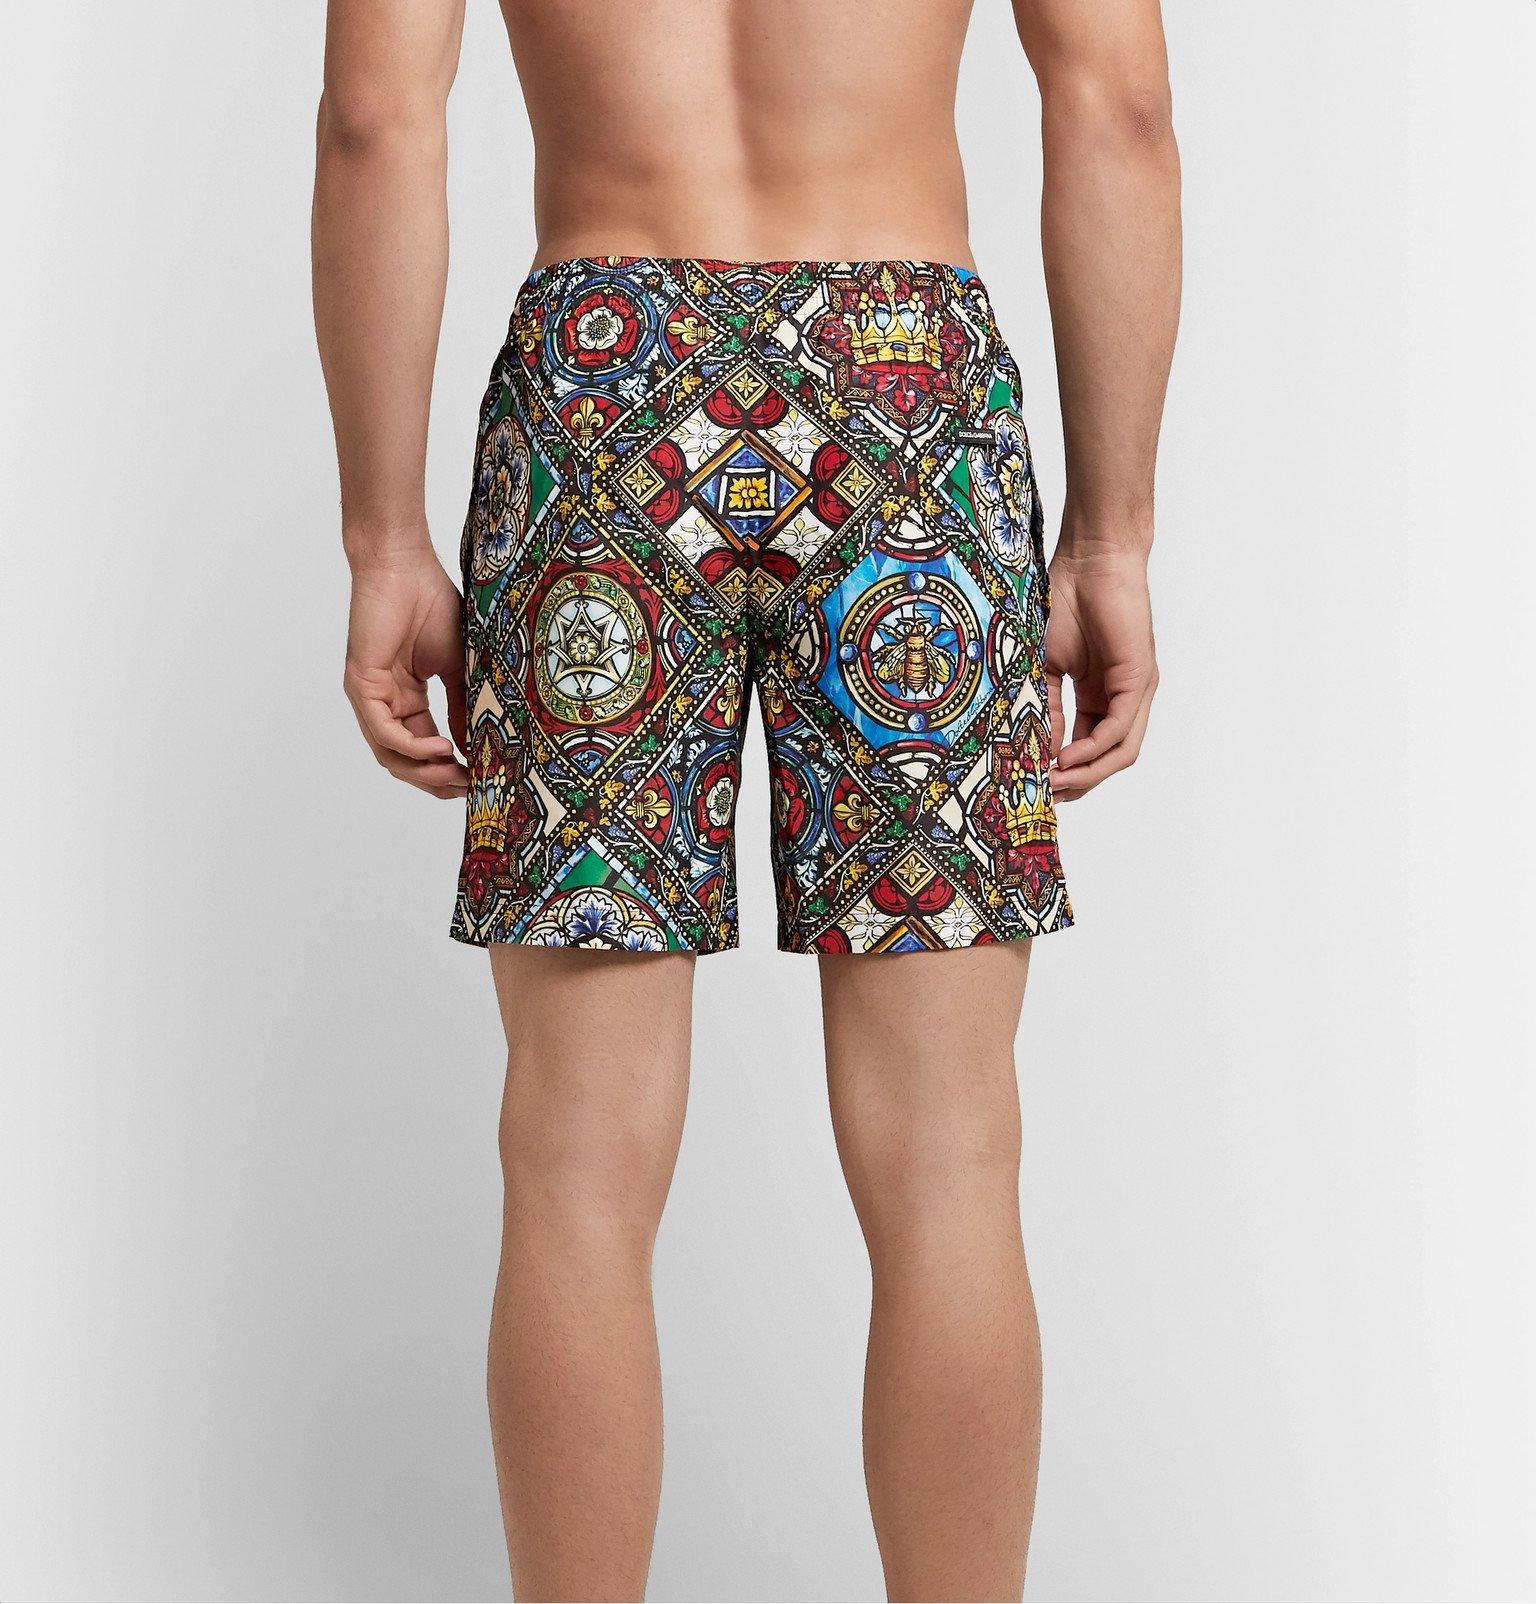 Dolce & Gabbana - Long-Length Printed Swim Shorts - Multi